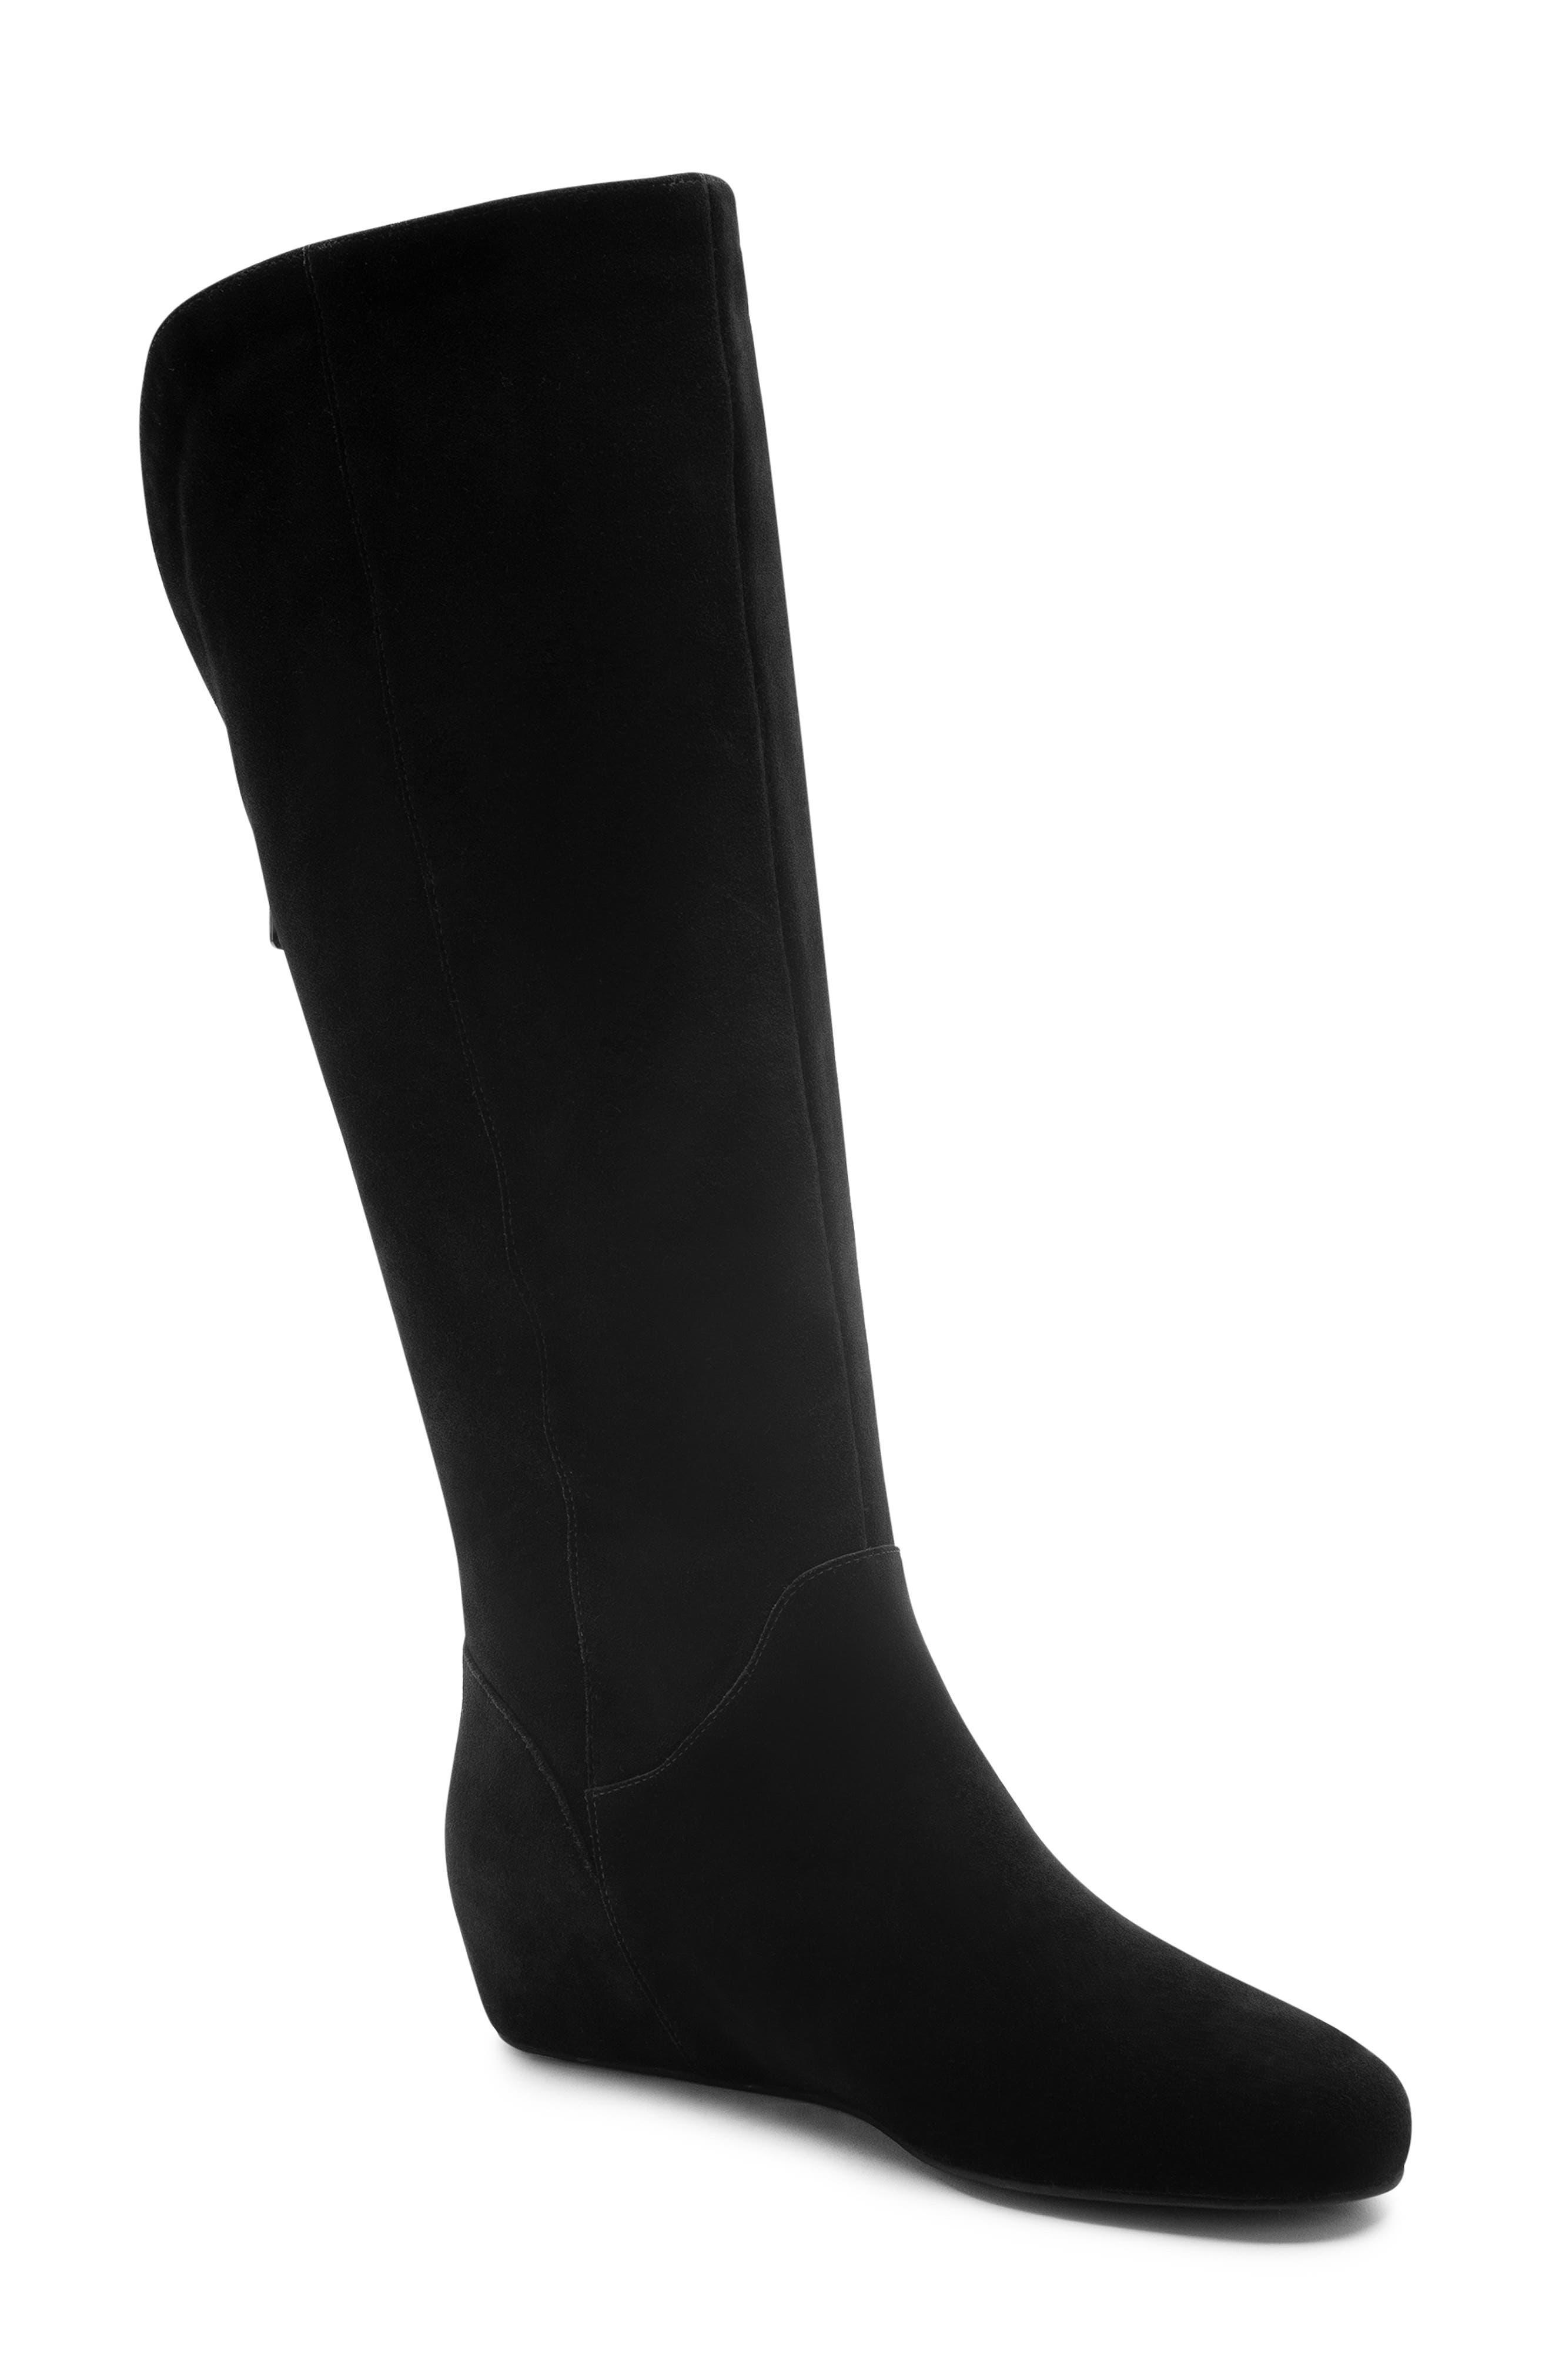 Mercy Waterproof Wedge Knee High Boot,                             Main thumbnail 1, color,                             BLACK SUEDE